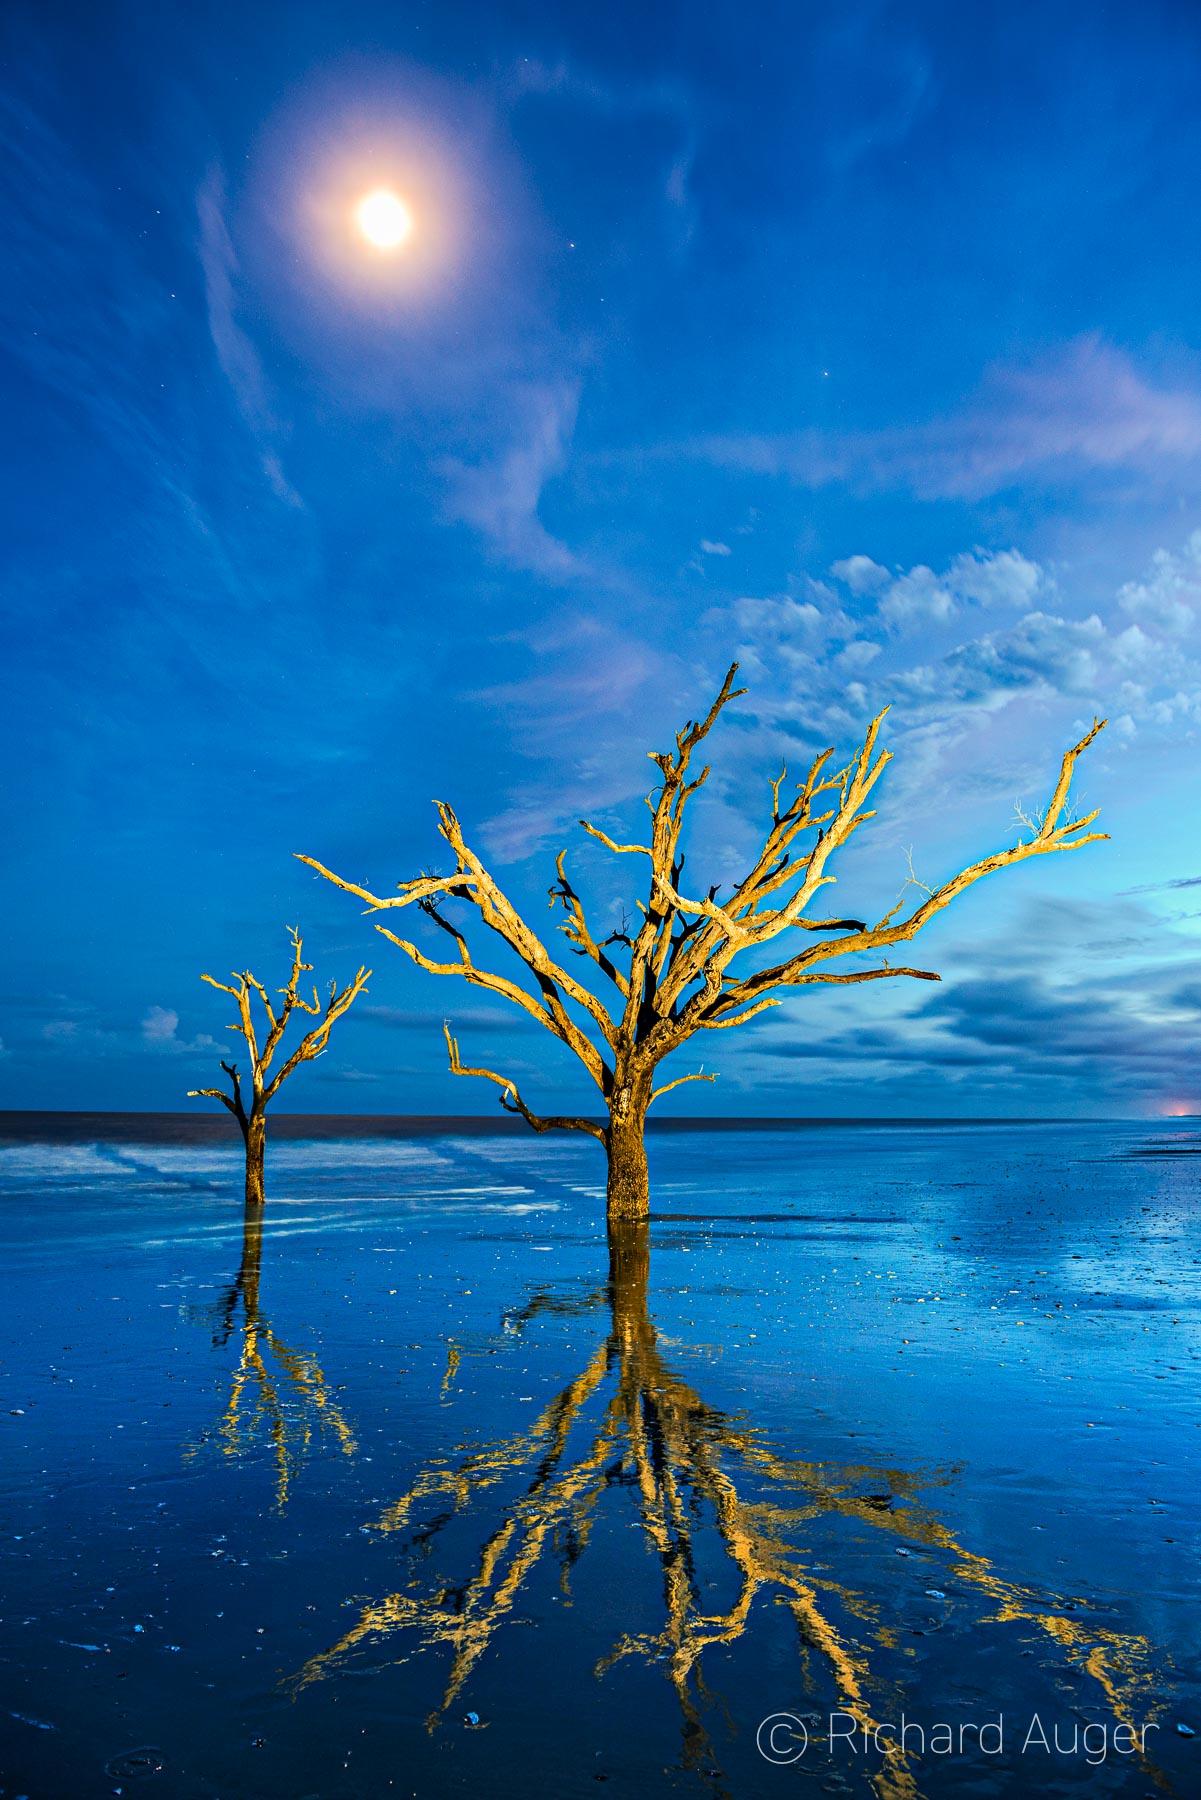 Edisto Island, Botany Bay, South Carolina, Driftwood, Night, Lighting, Reflections, Moon